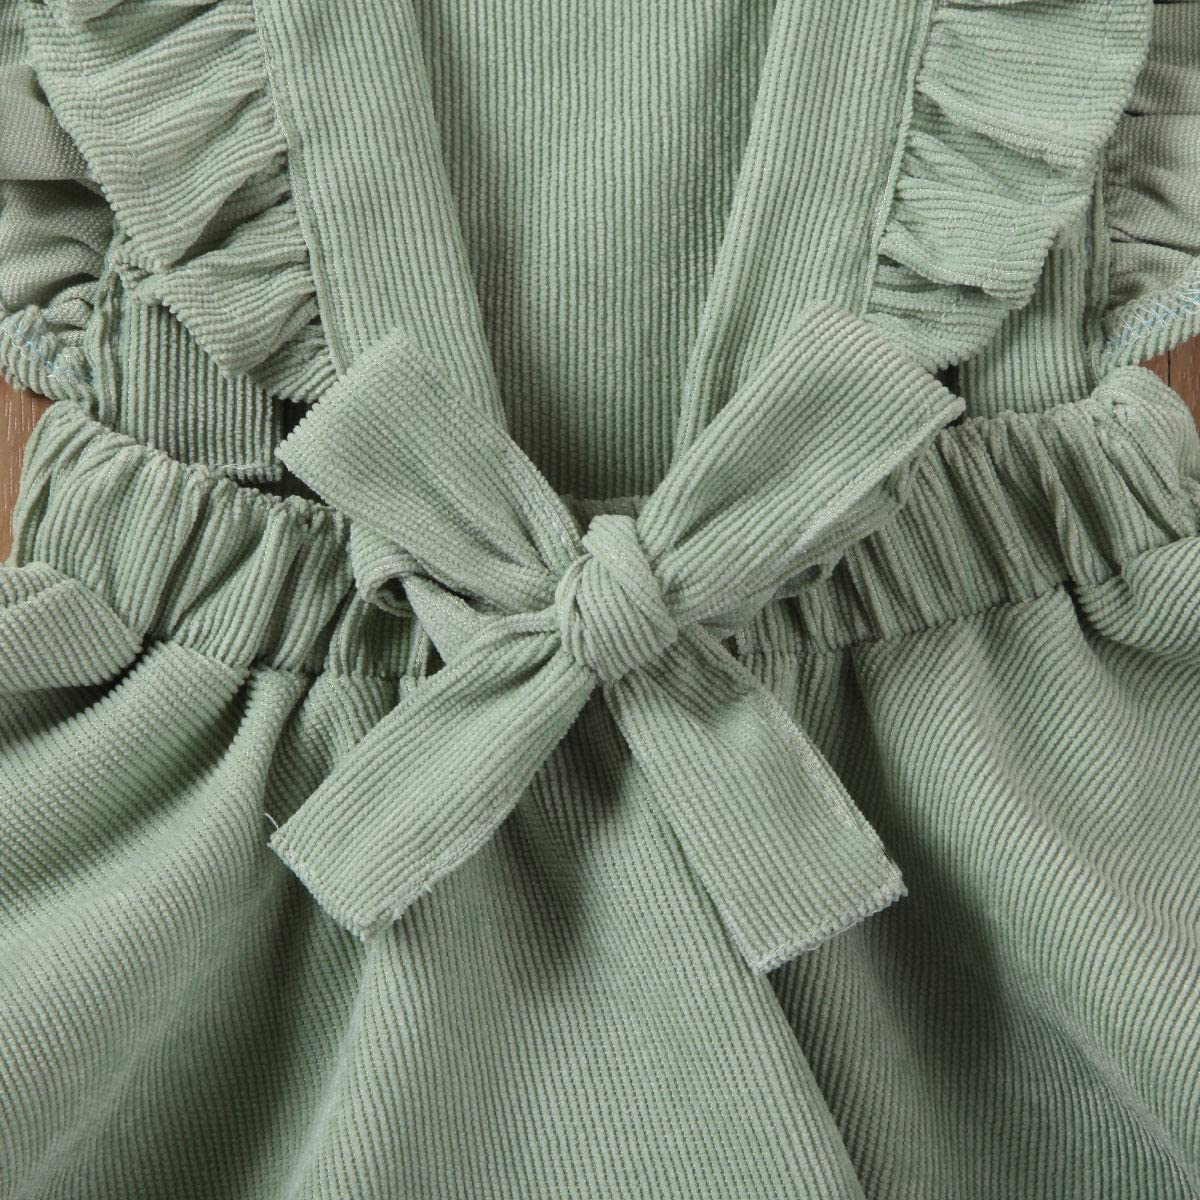 LuLuBaby Toddler Baby Girl Ruffle Sleeveless Overall Dress Princess Suspender Skirt Outfit